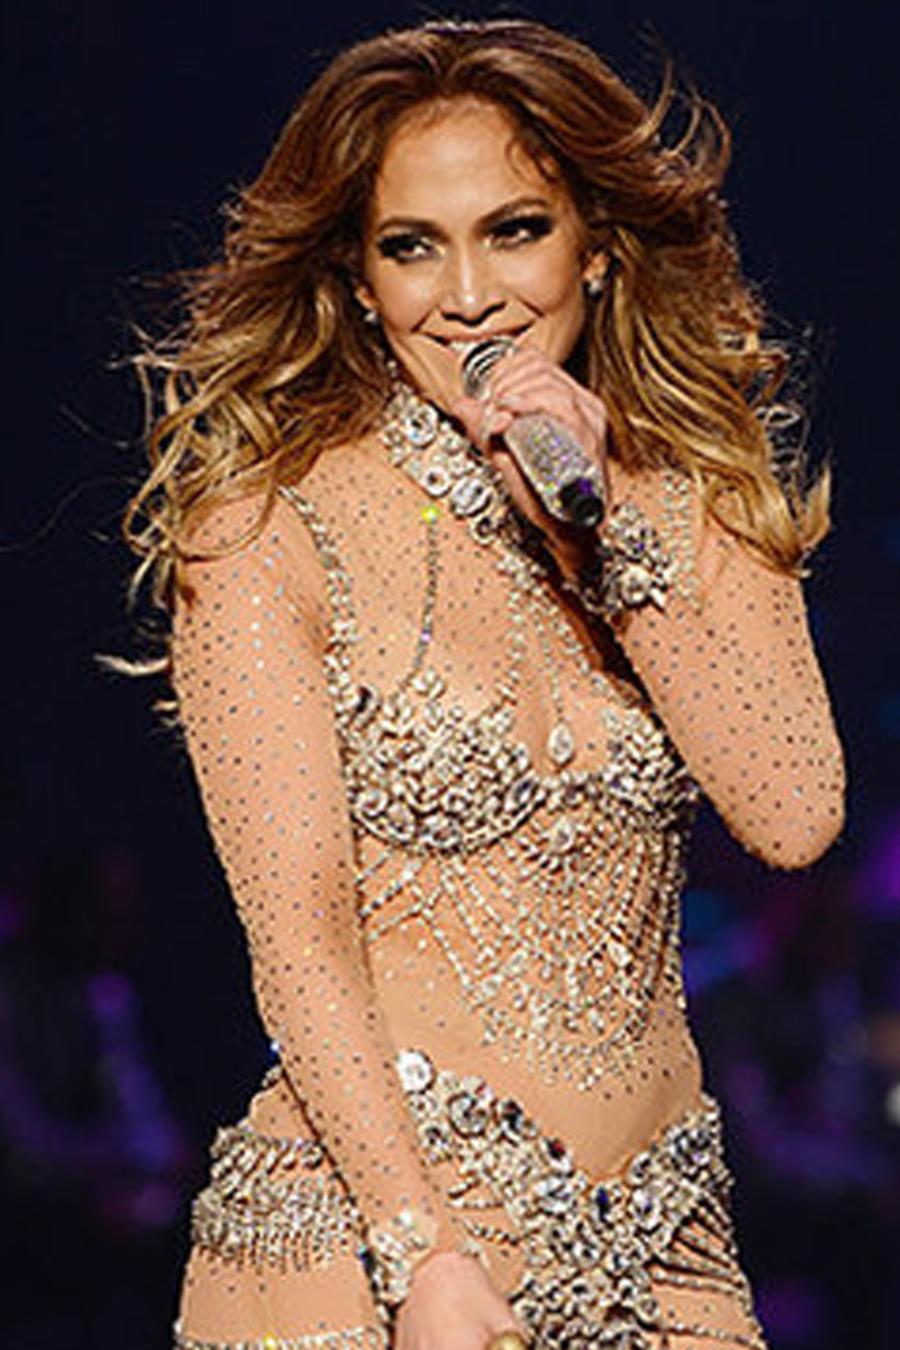 Jennifer Lopez en Las Vegas 2016